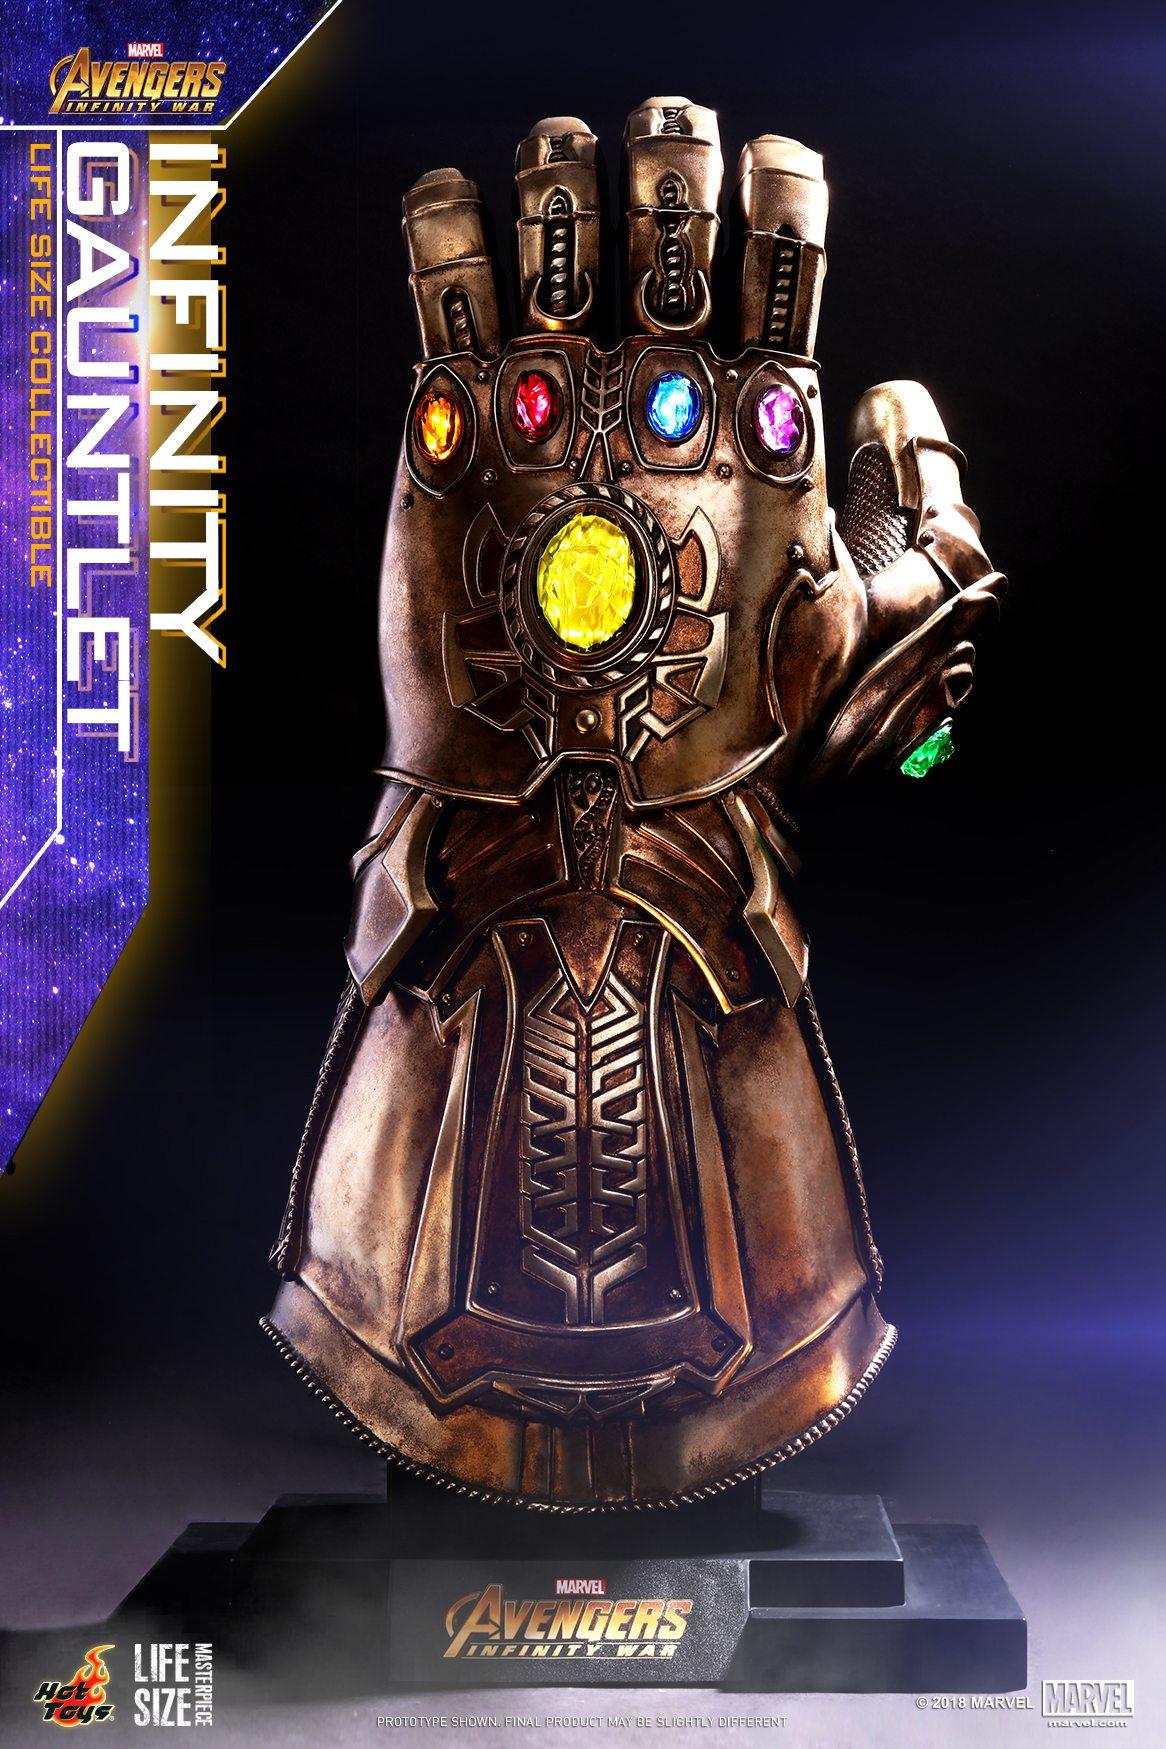 Avengers Infinity War Streamkiste